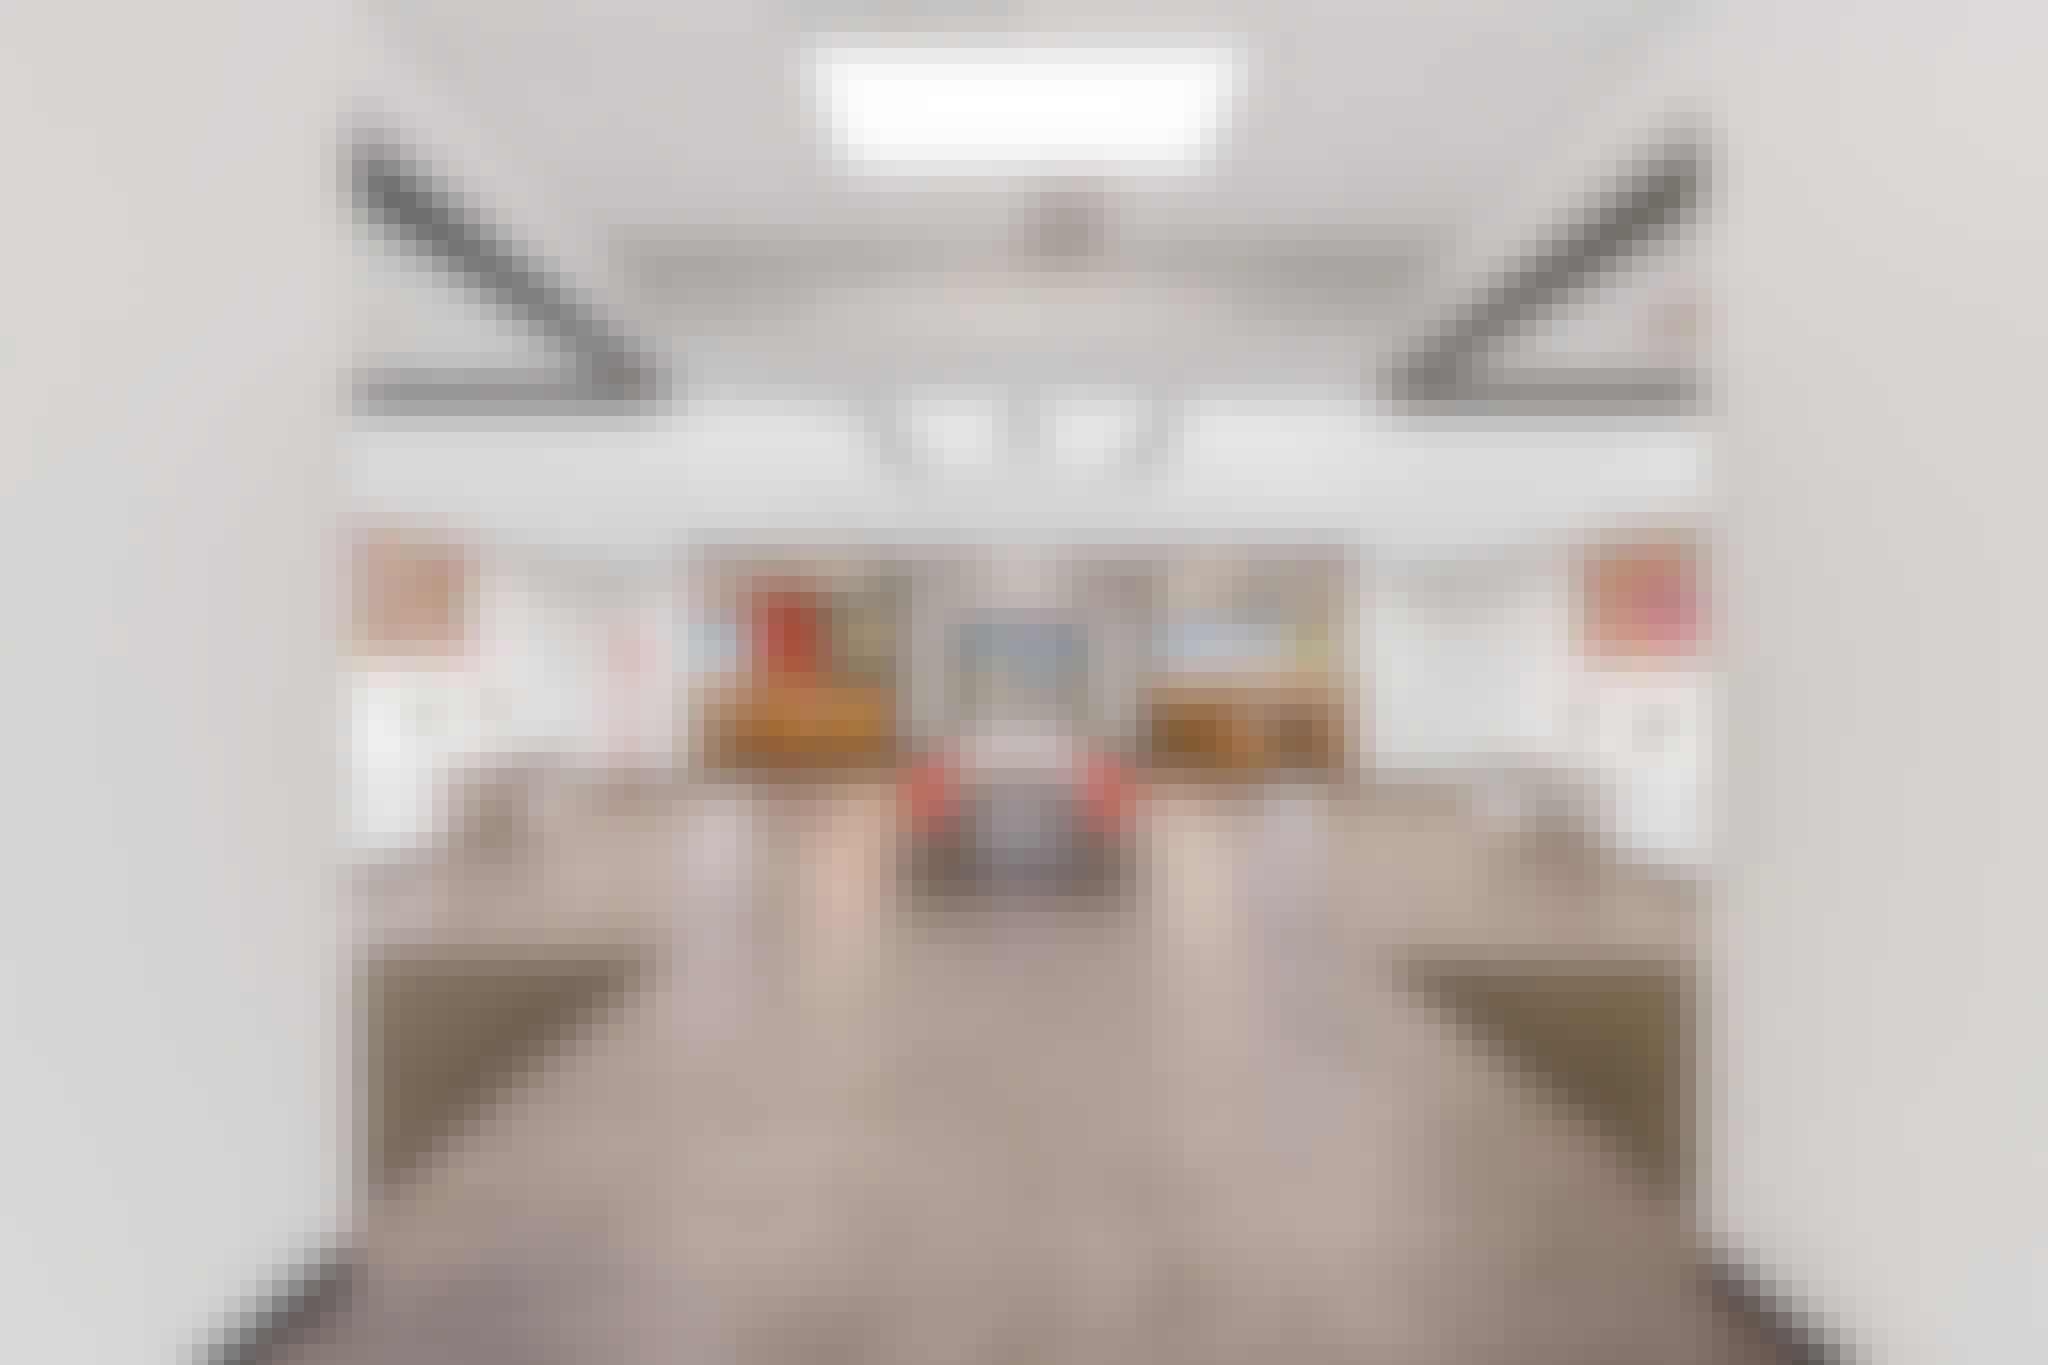 learning hub design with NanaWall sliding glass walls